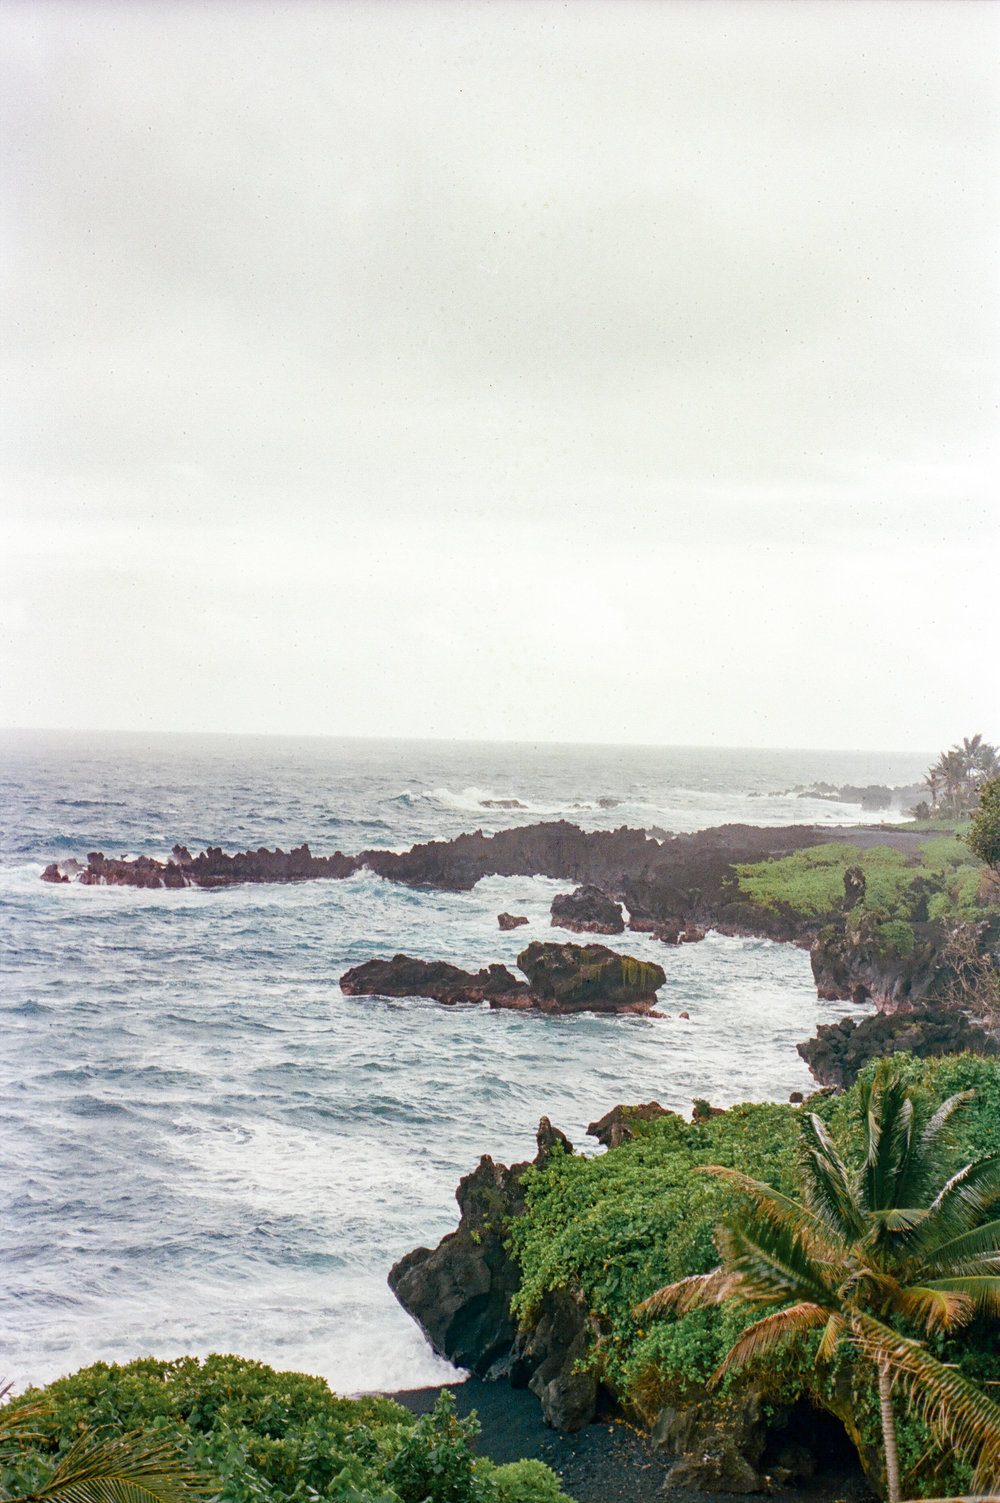 kels&michael_Maui-17.jpg